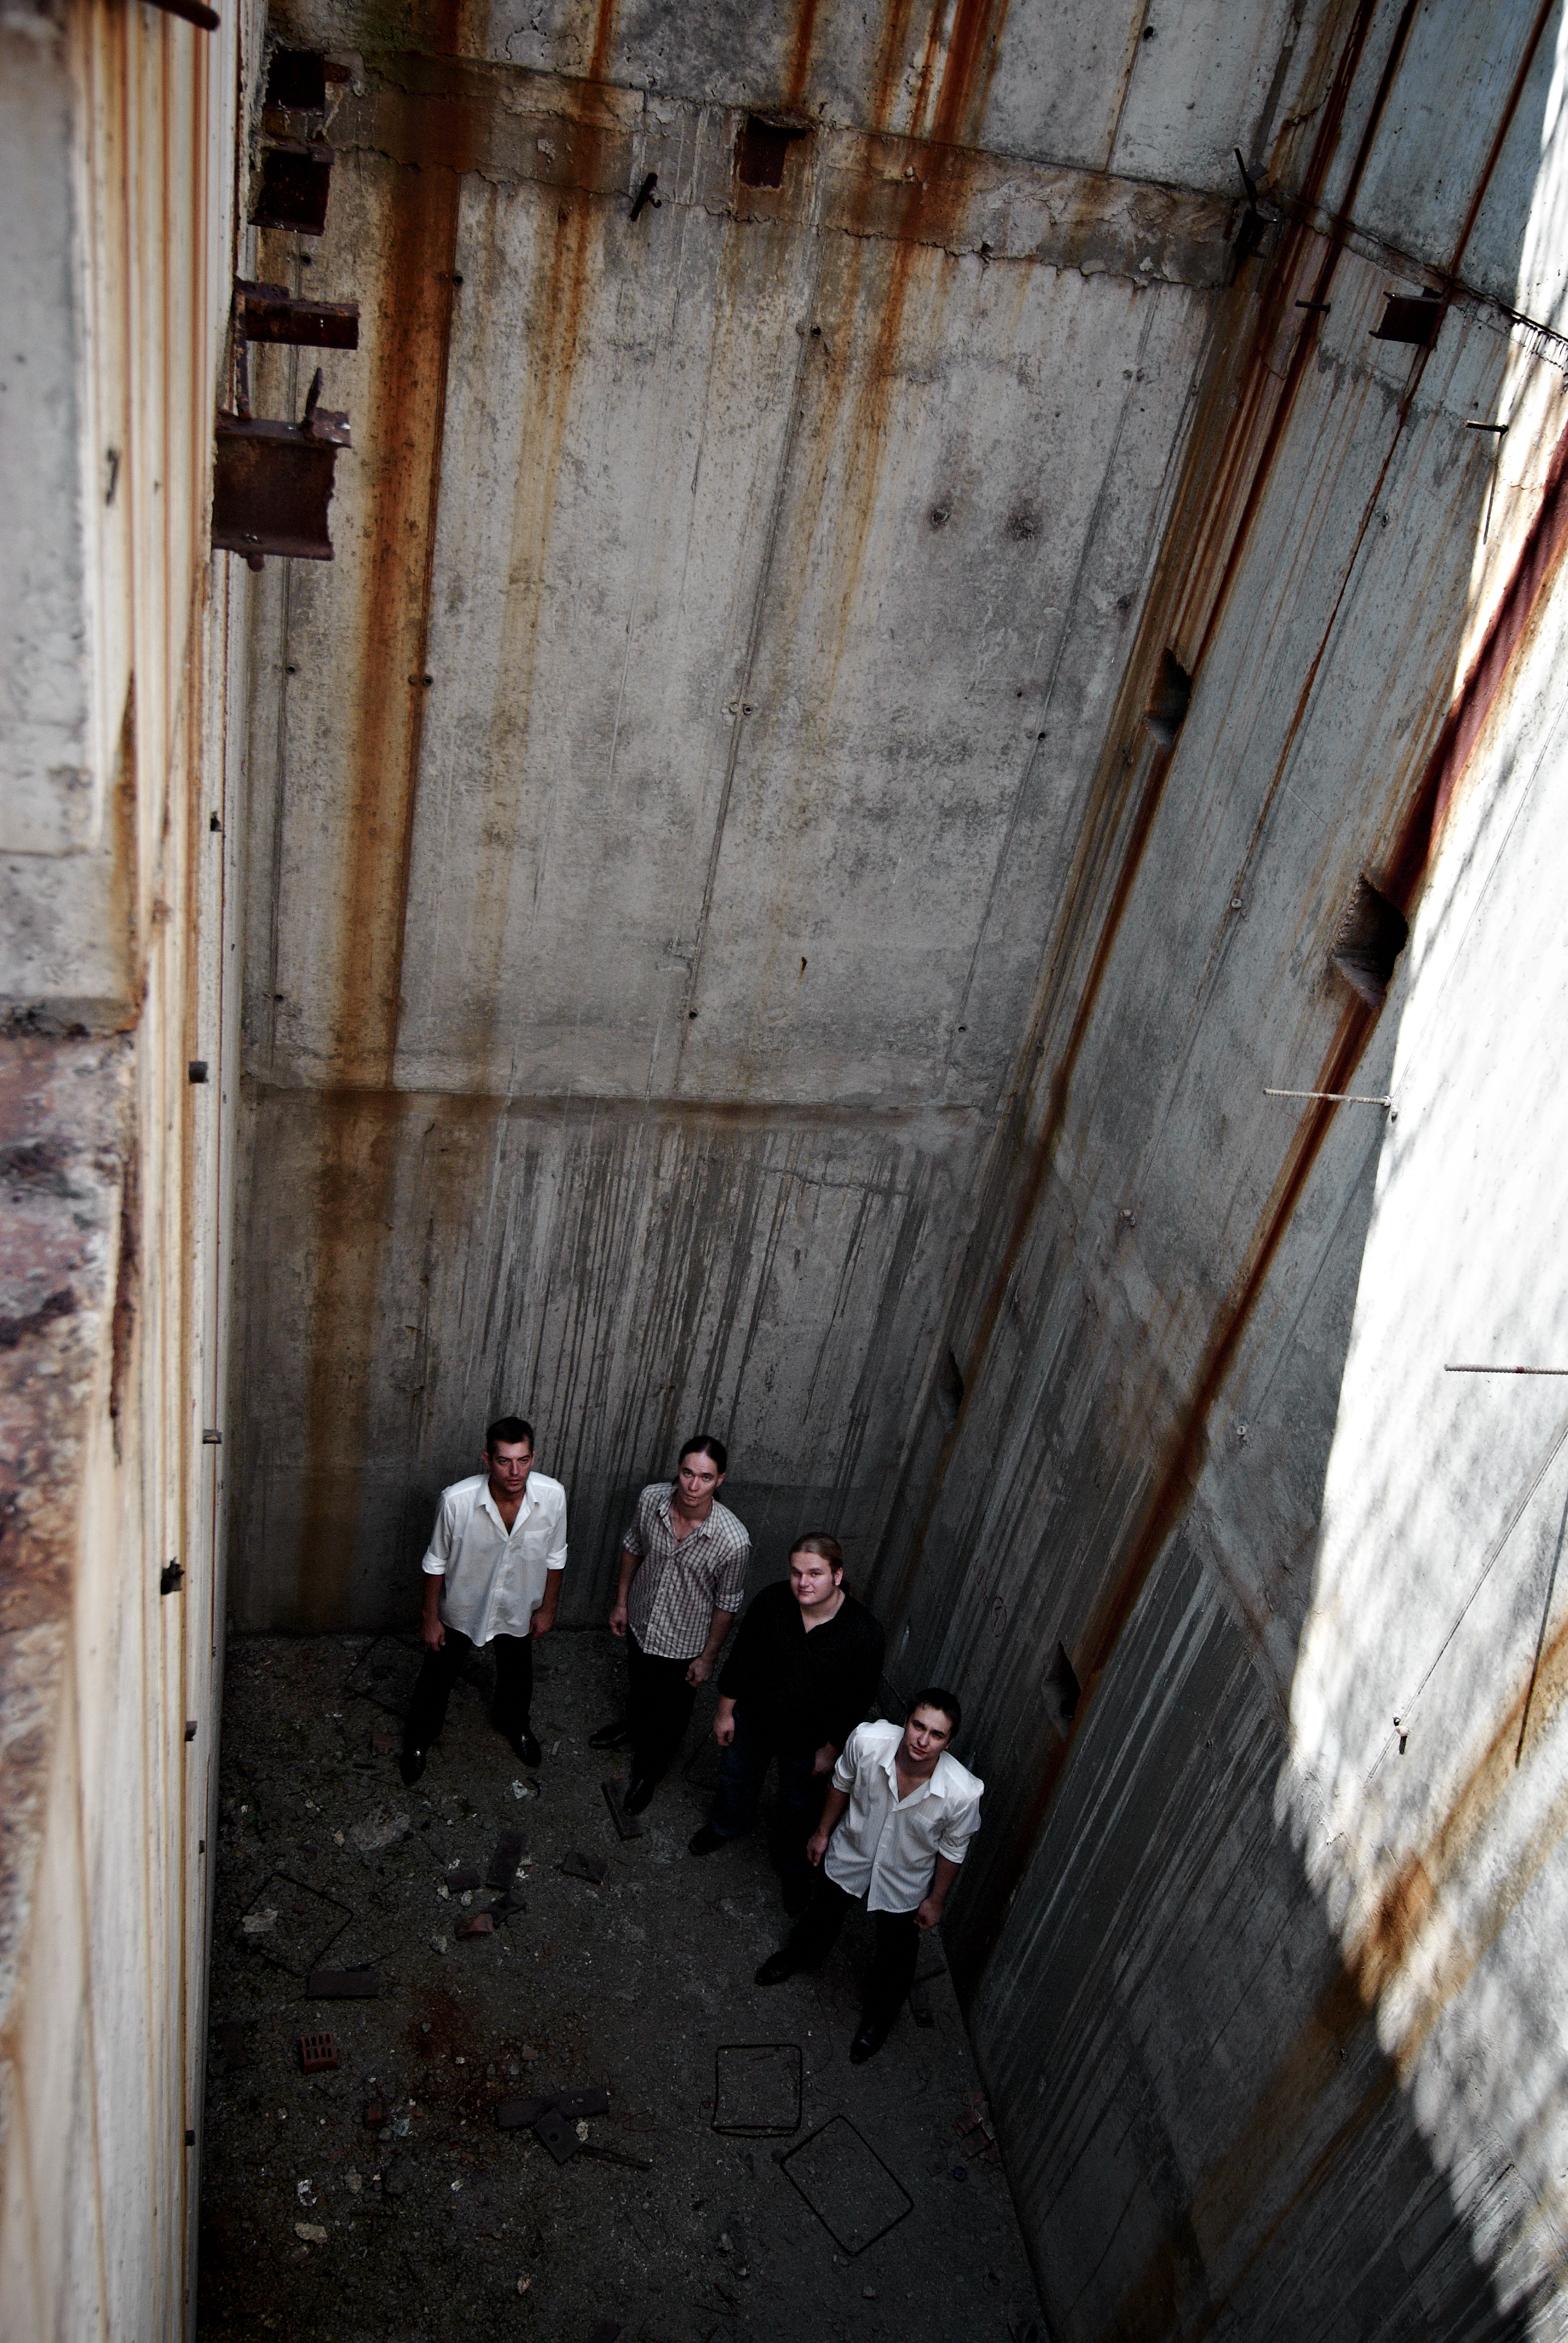 Odradek Room | Hypnotic Dirge Records